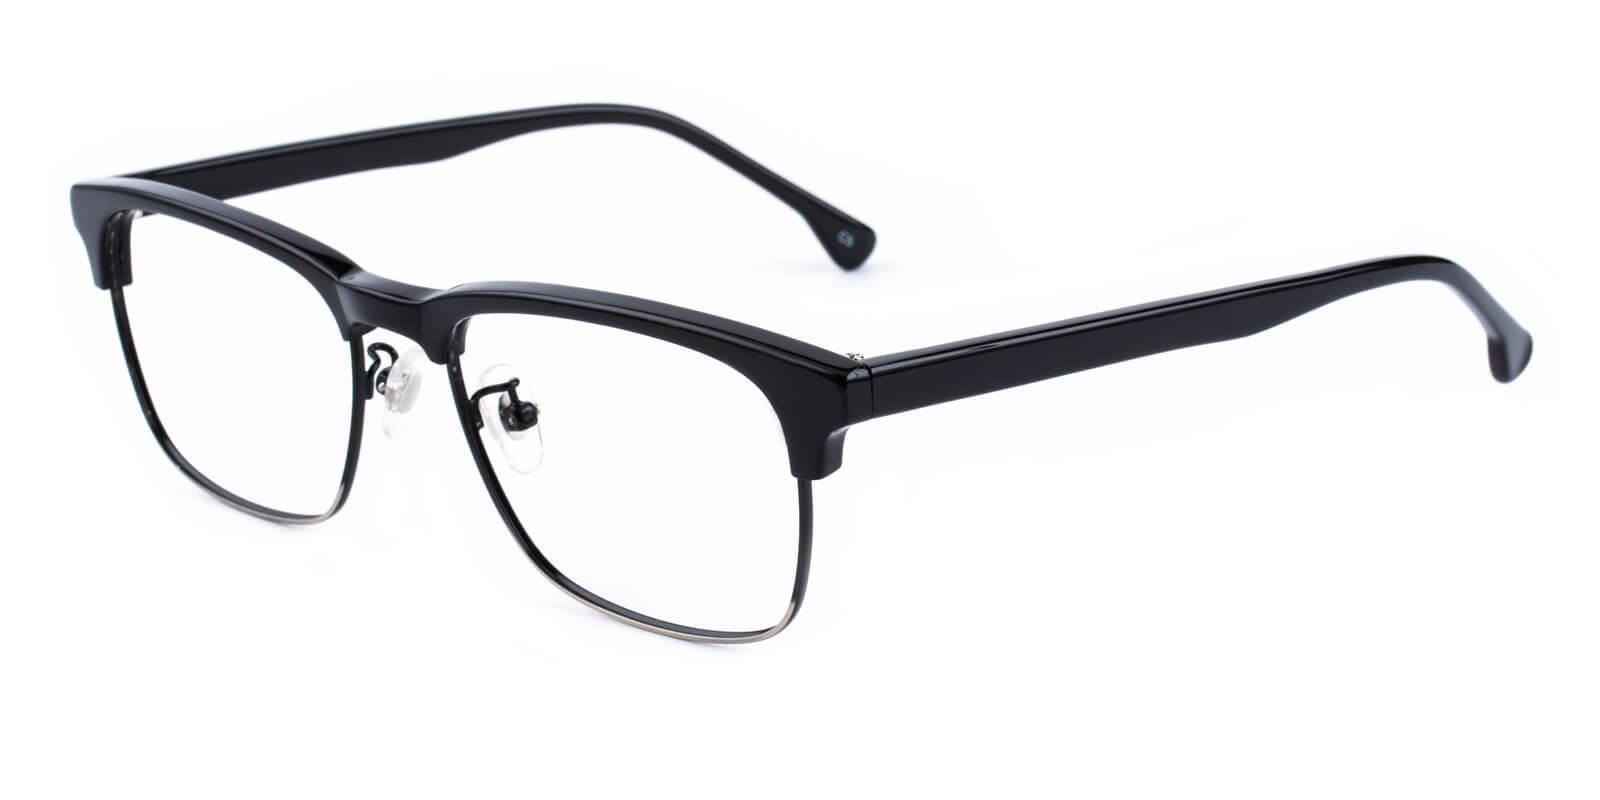 Sublime-Black-Browline-Combination-Eyeglasses-additional1